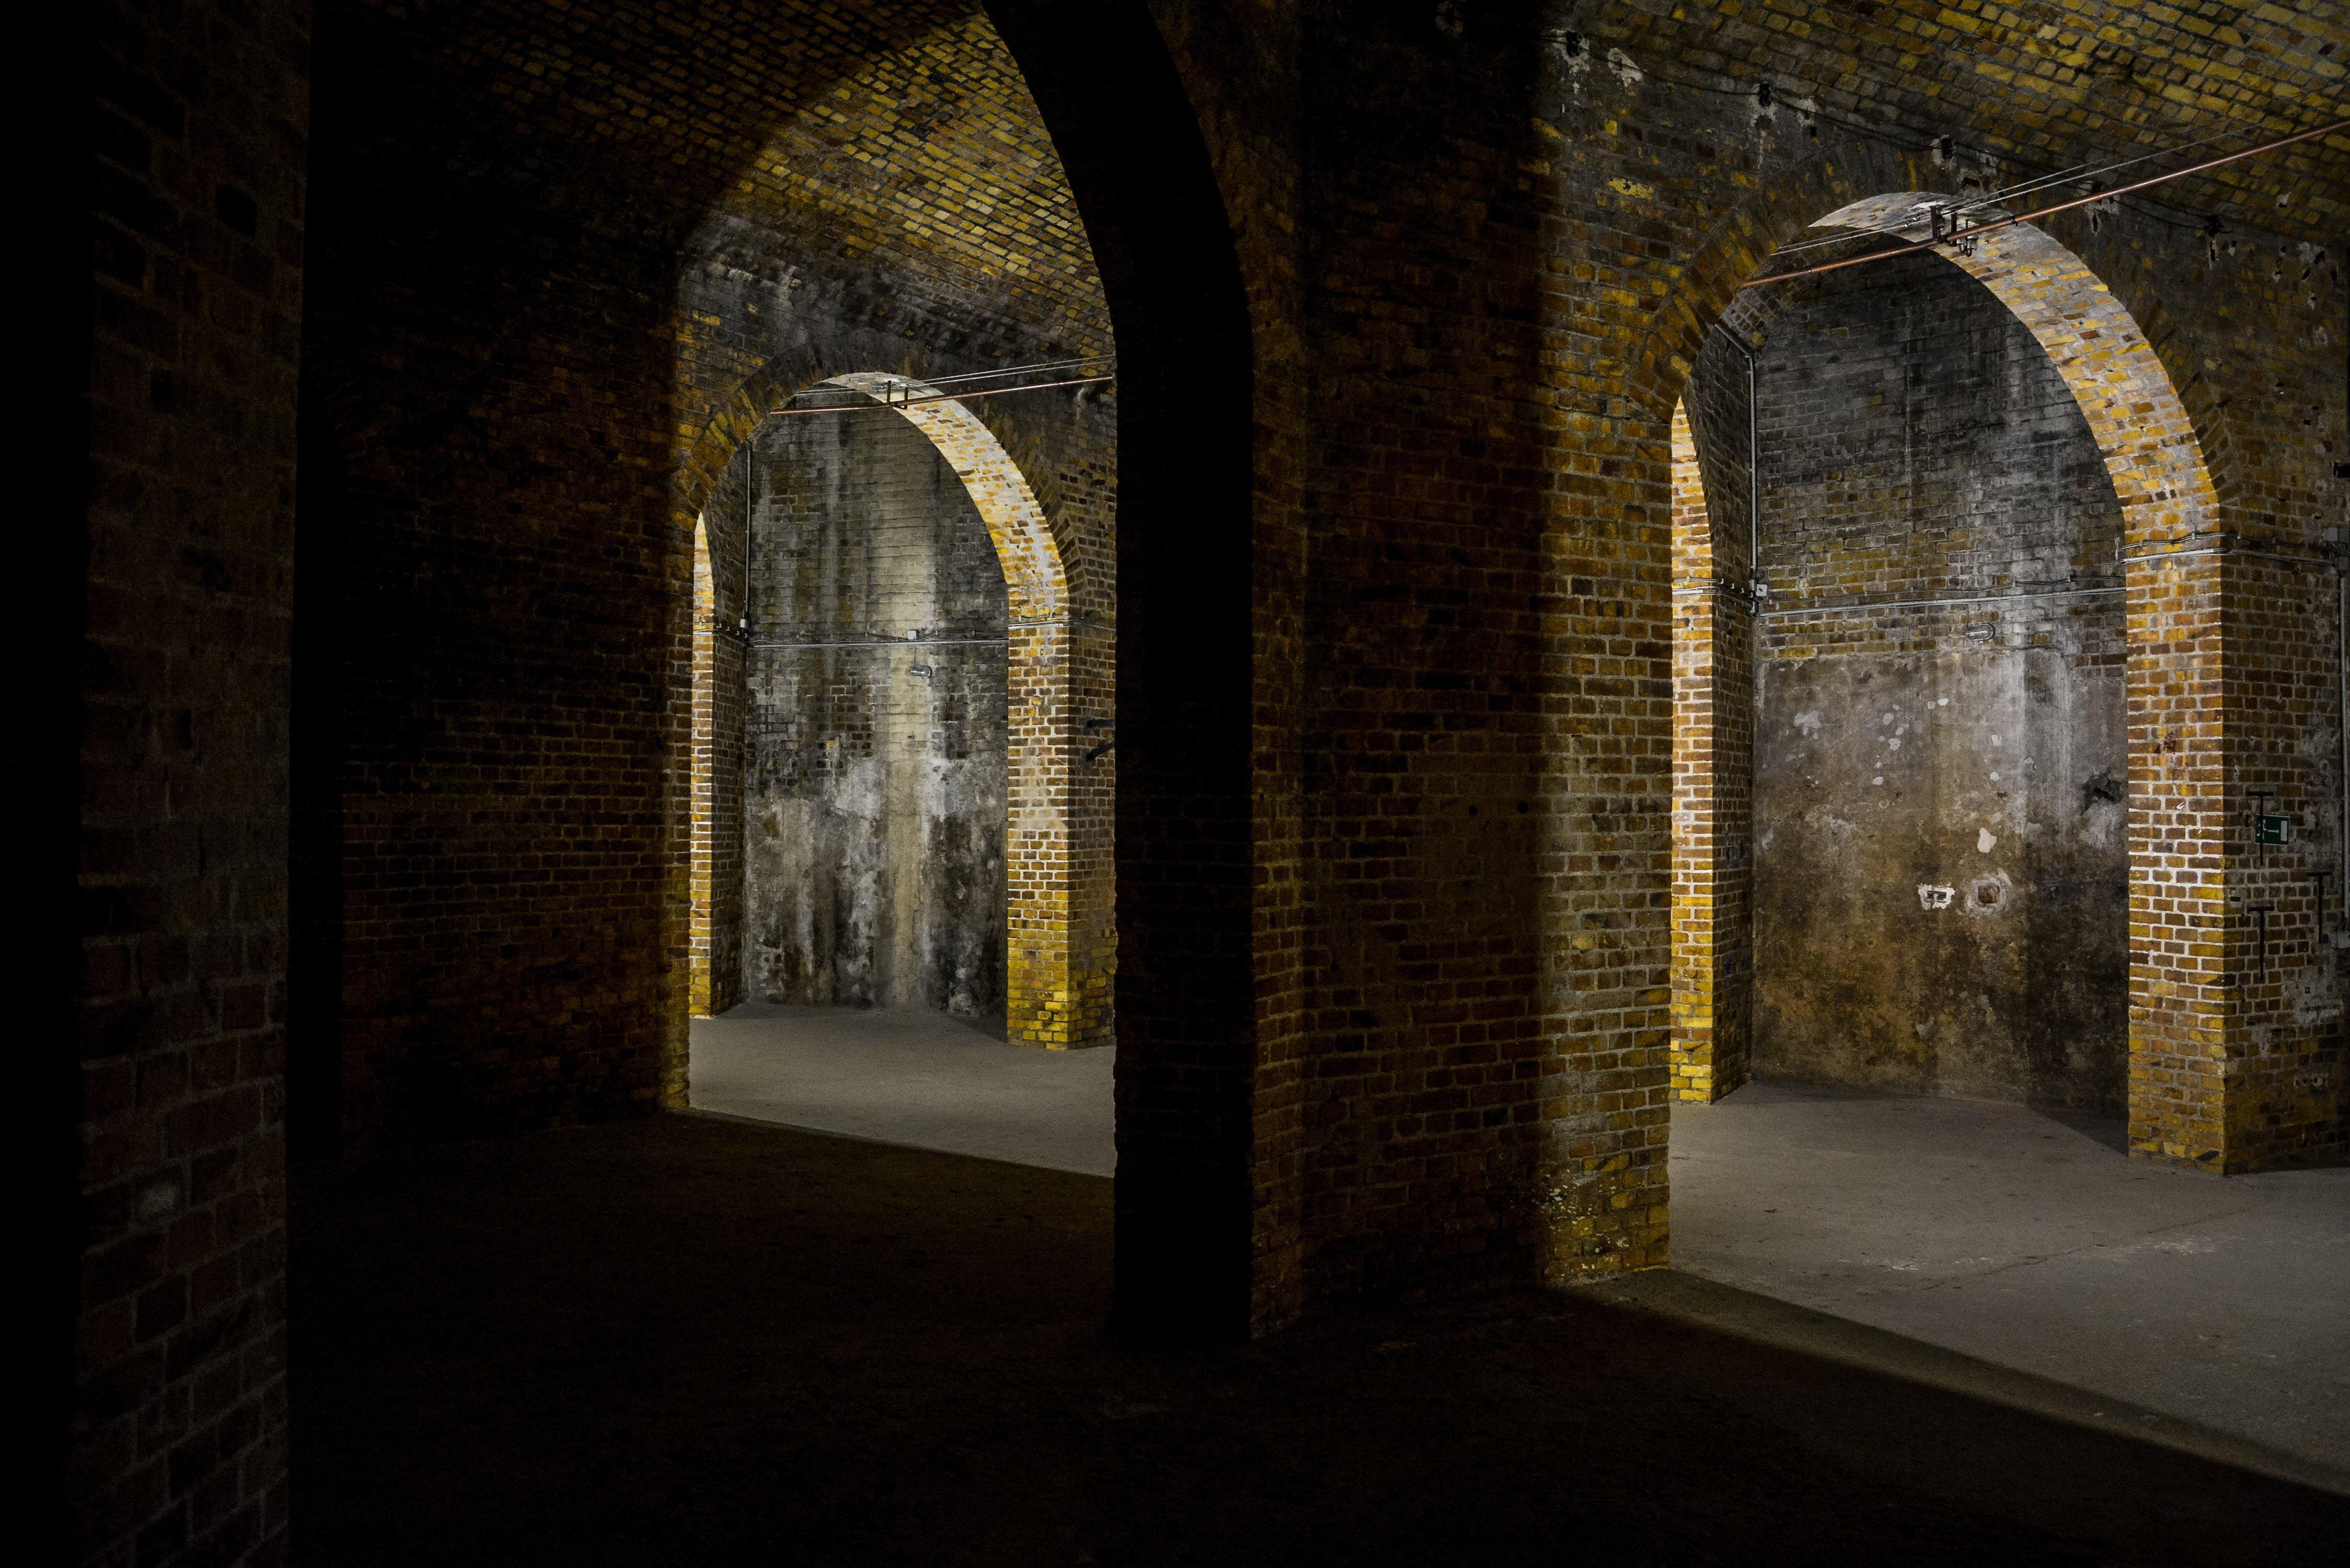 berlin prenzlauer berg wasserturm kleines wasserreservoir gewoelbe treppen water tower small water reservoir catacombs